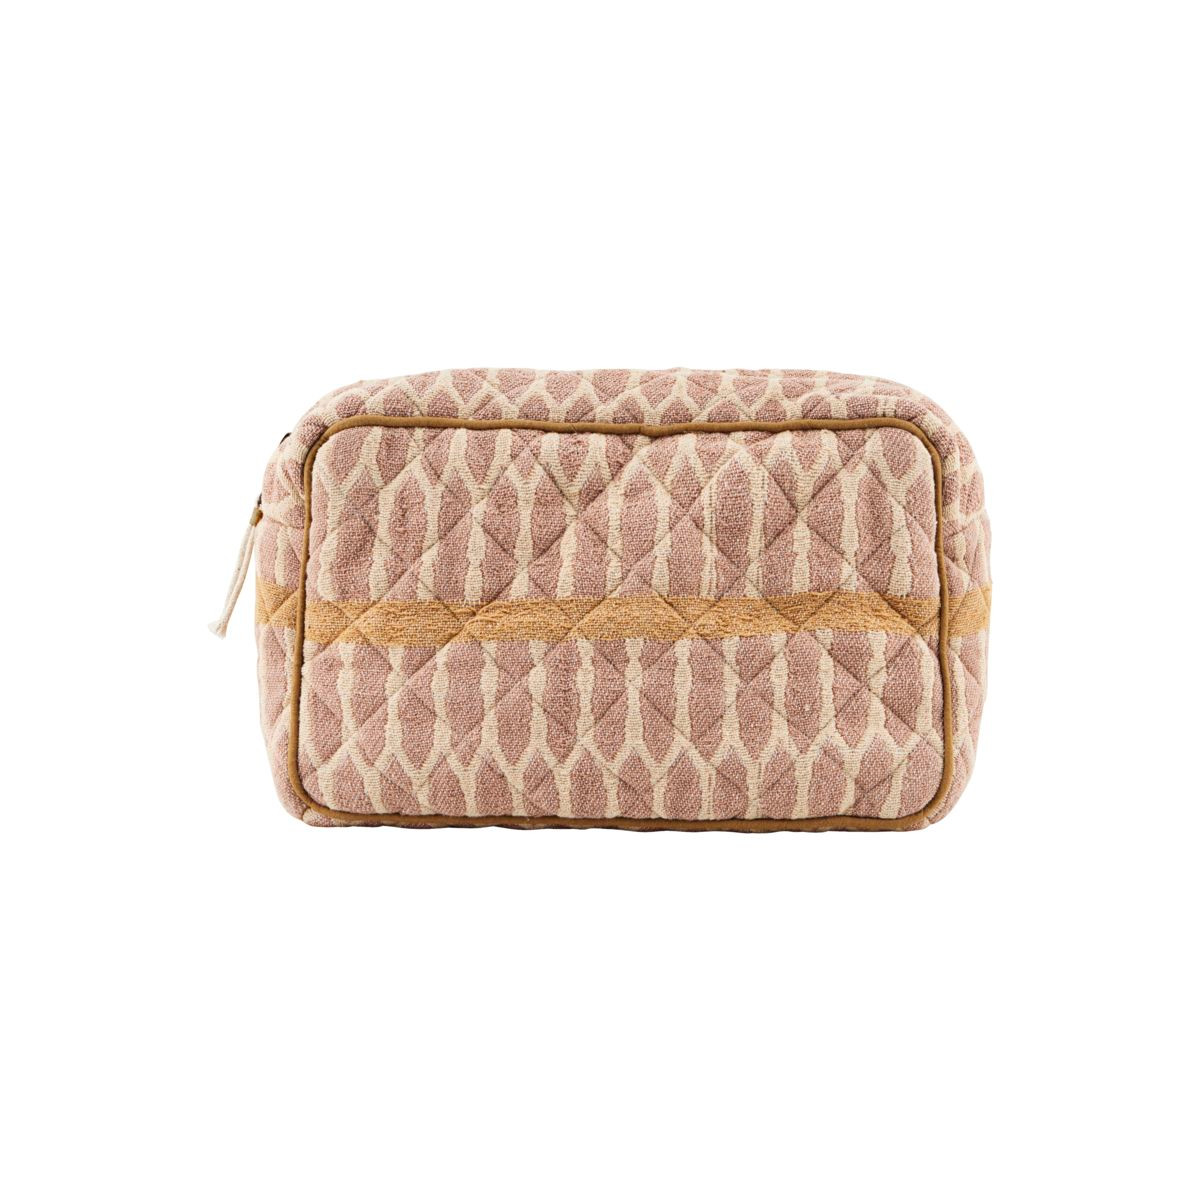 Meraki Makeup Bag Mustard/Terracotta/Sand